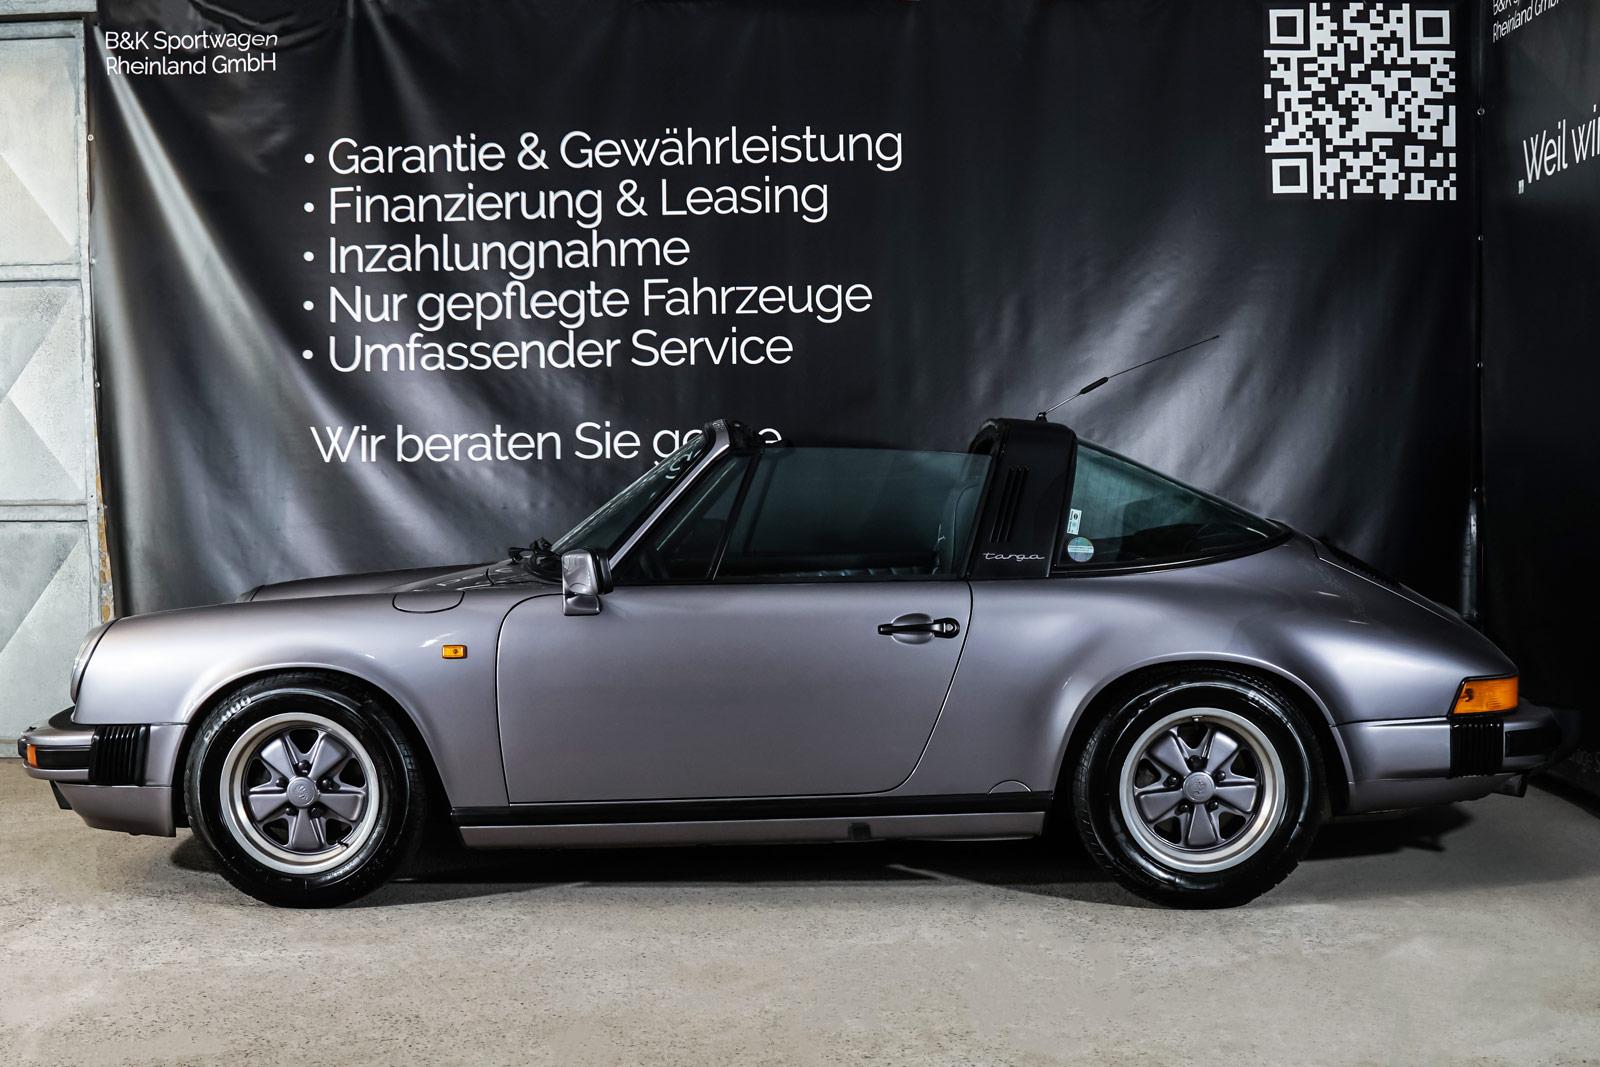 Porsche_911_Targa_Diamantblaumetallic_Blau_POR-0092_6_w